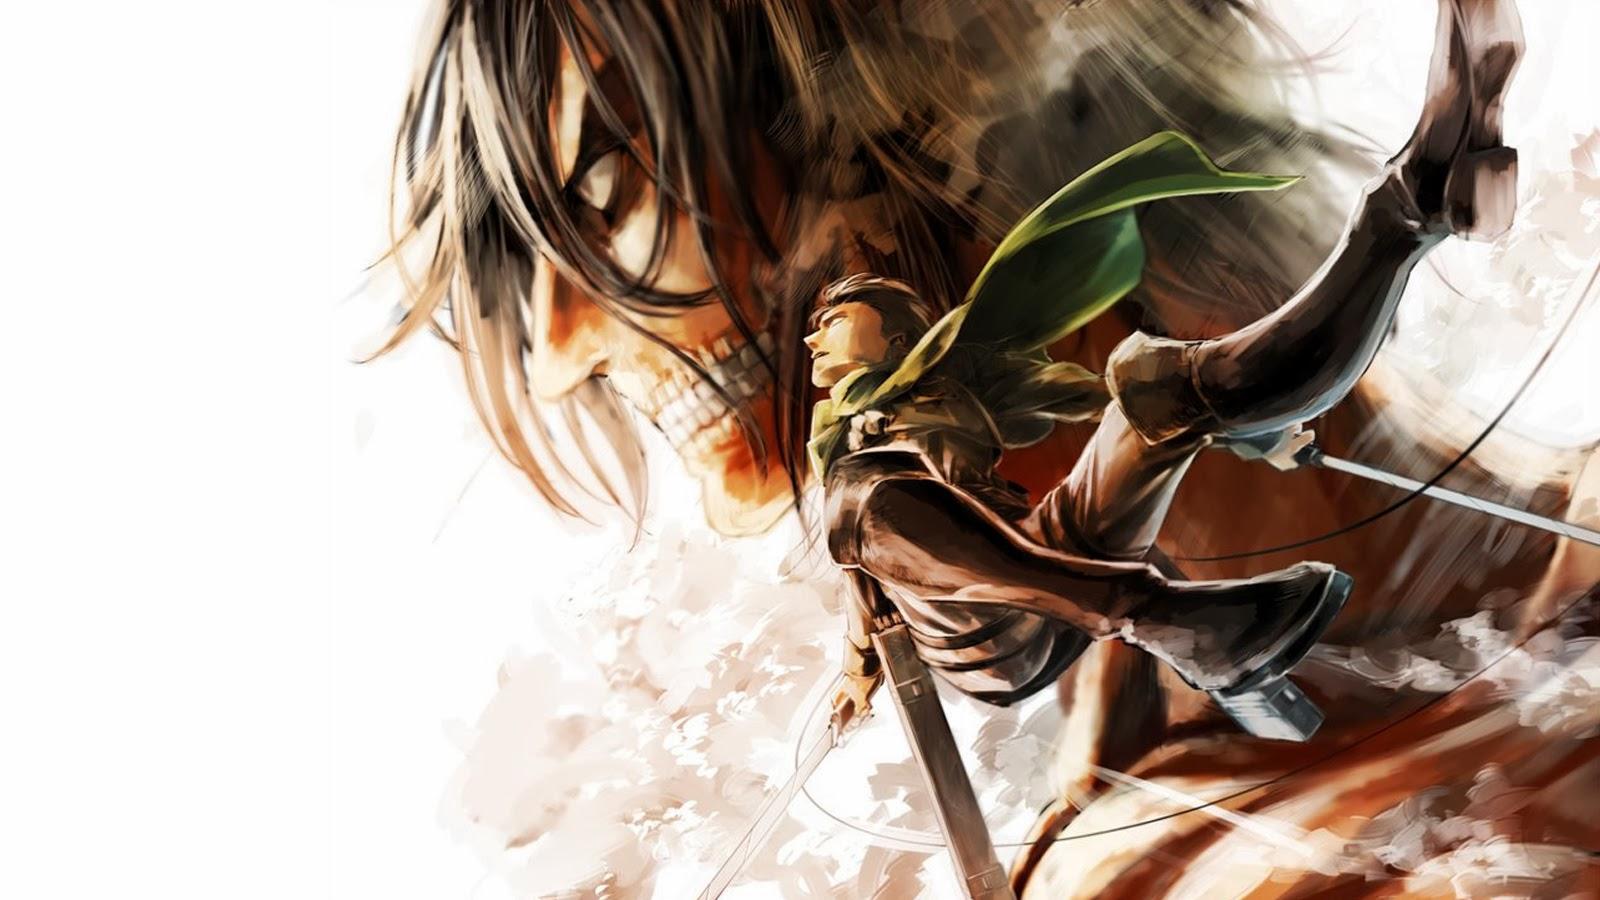 levi rogue titan eren jaeger yeager attack on titan shingeki no kyojin 1600x900